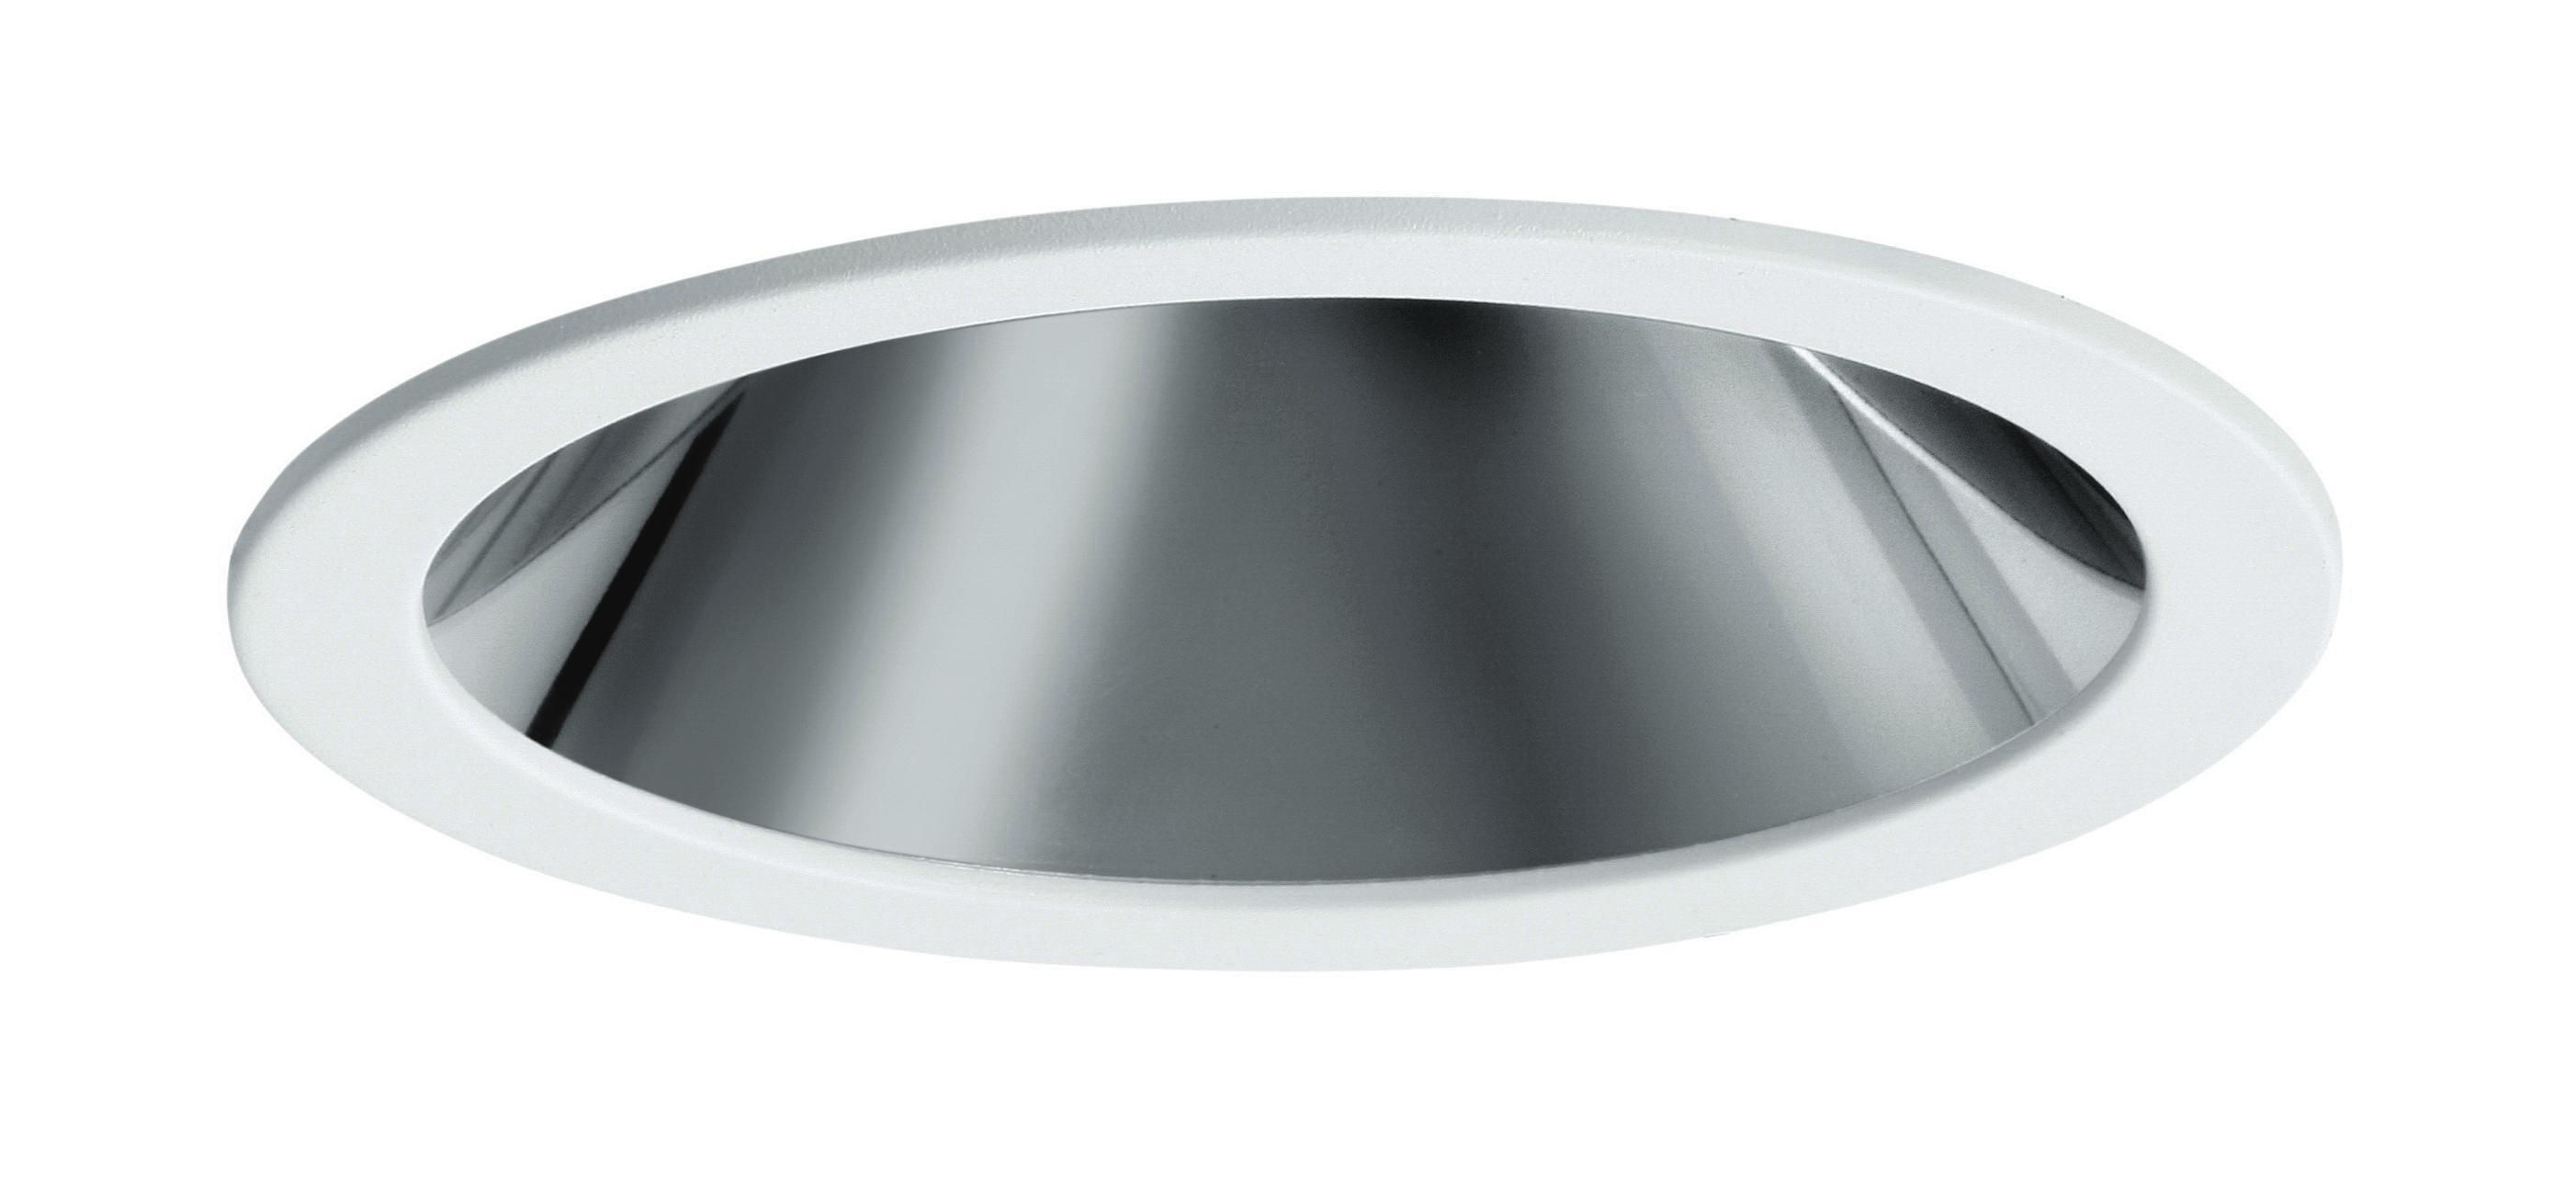 1 Stk Kain LED Downlight 24W 3000K 1800lm, 62°, DIM 1-10V, RAL9003 LI99000526